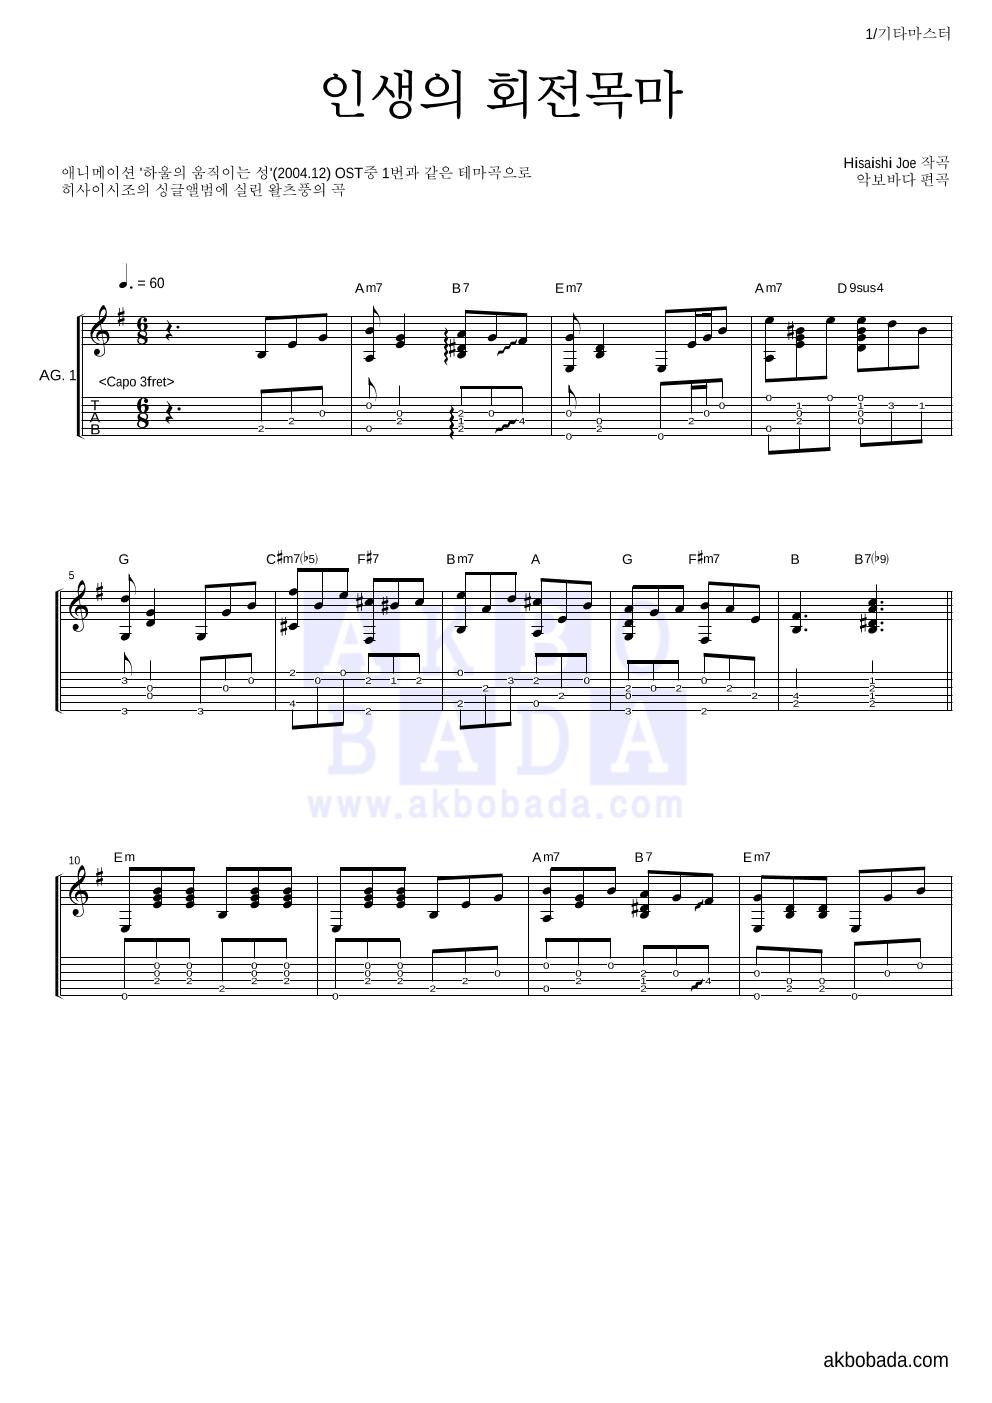 Hisaishi Joe - 인생의 회전목마 기타 마스터 악보